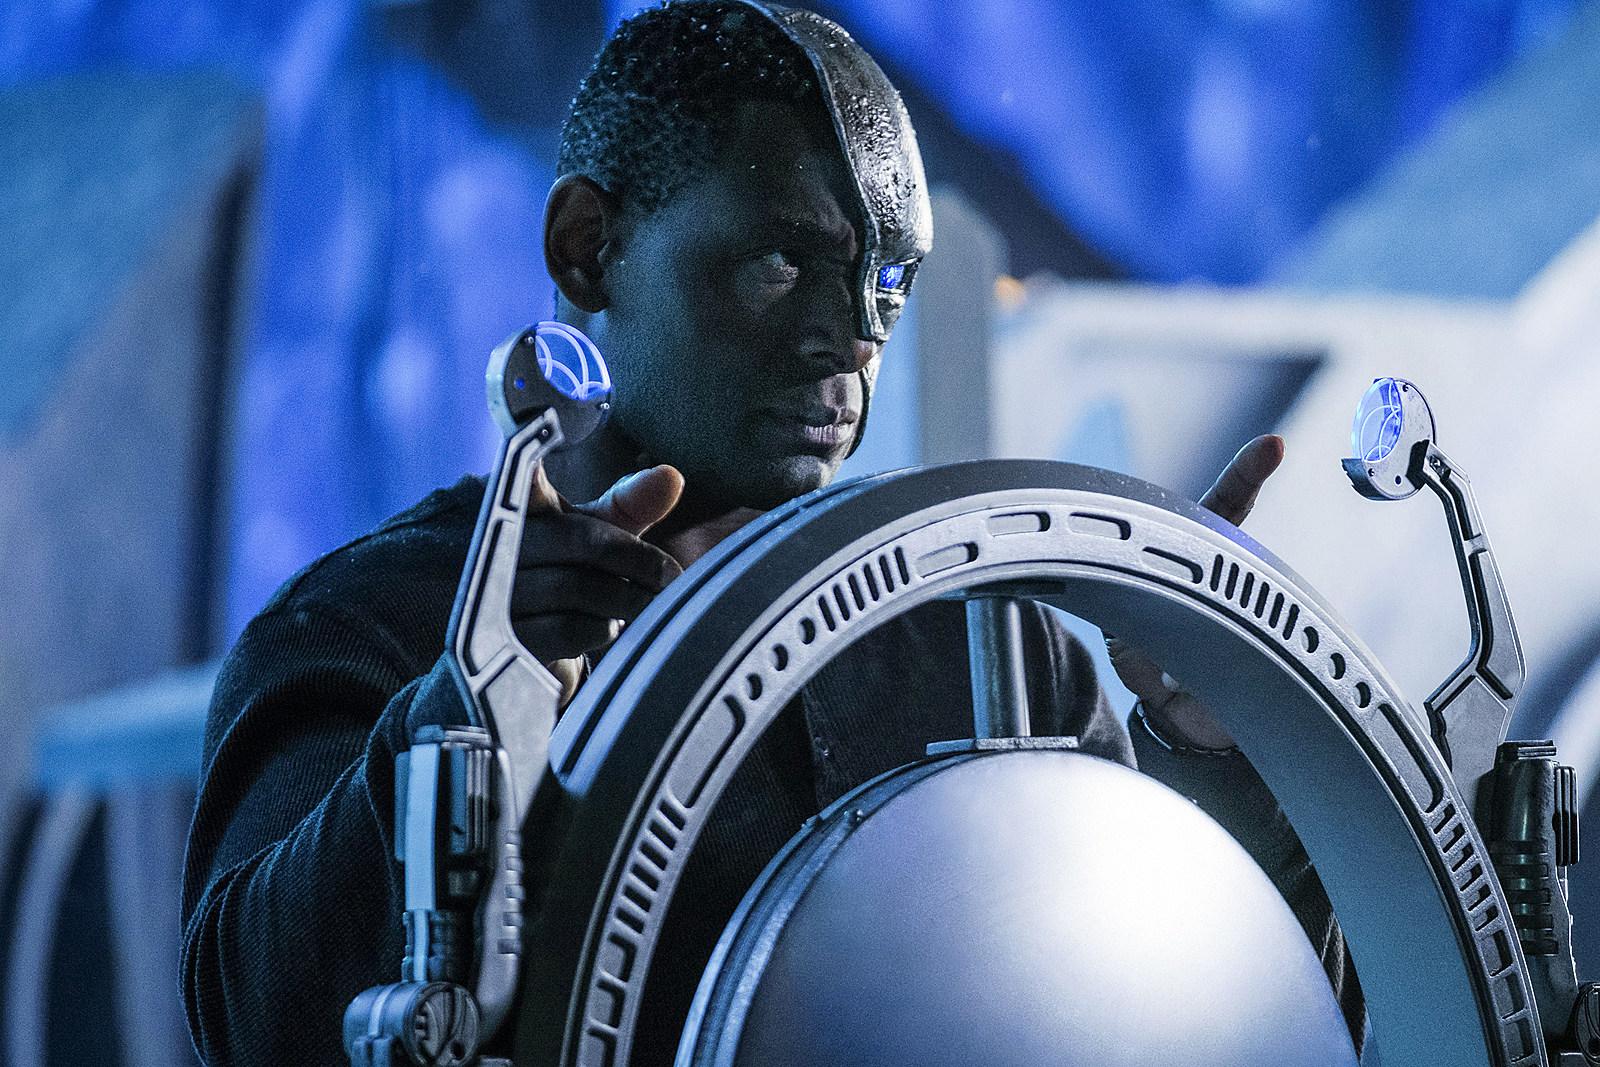 Supergirl's David Harewood Blasts 'Boring' Cyborg Superman